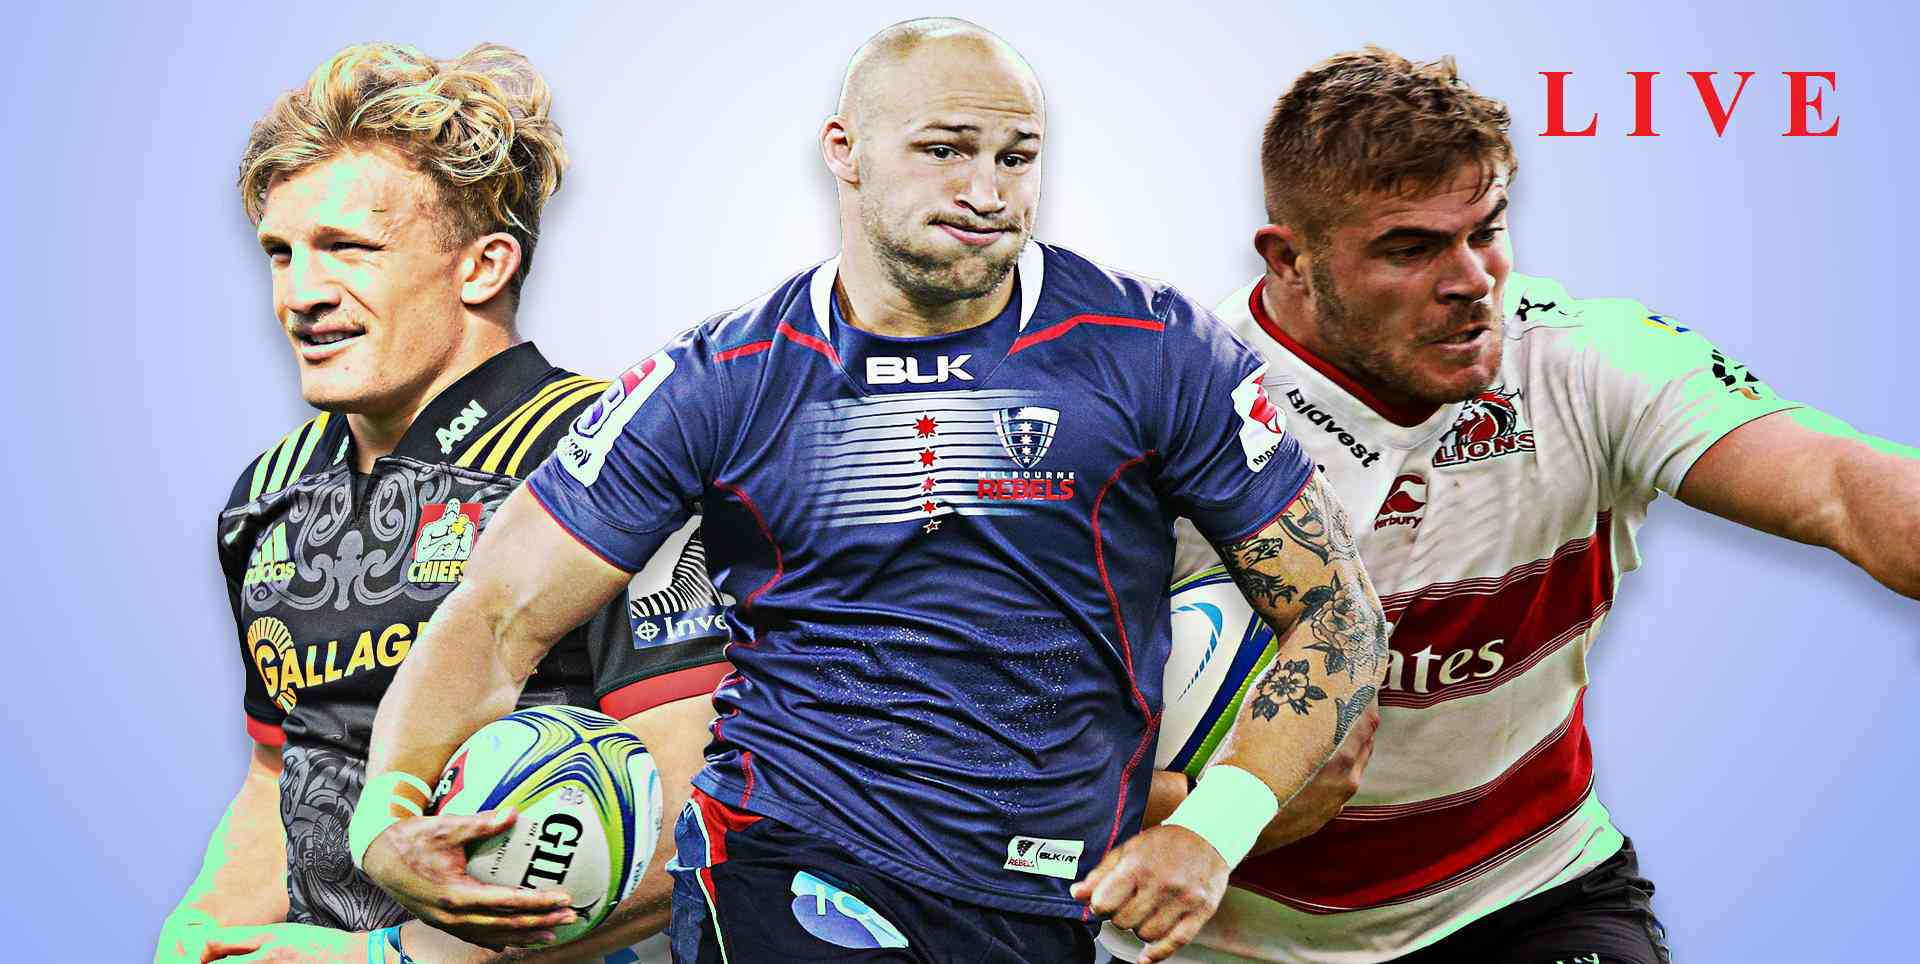 brive-vs-worcester-warriors-rugby-live